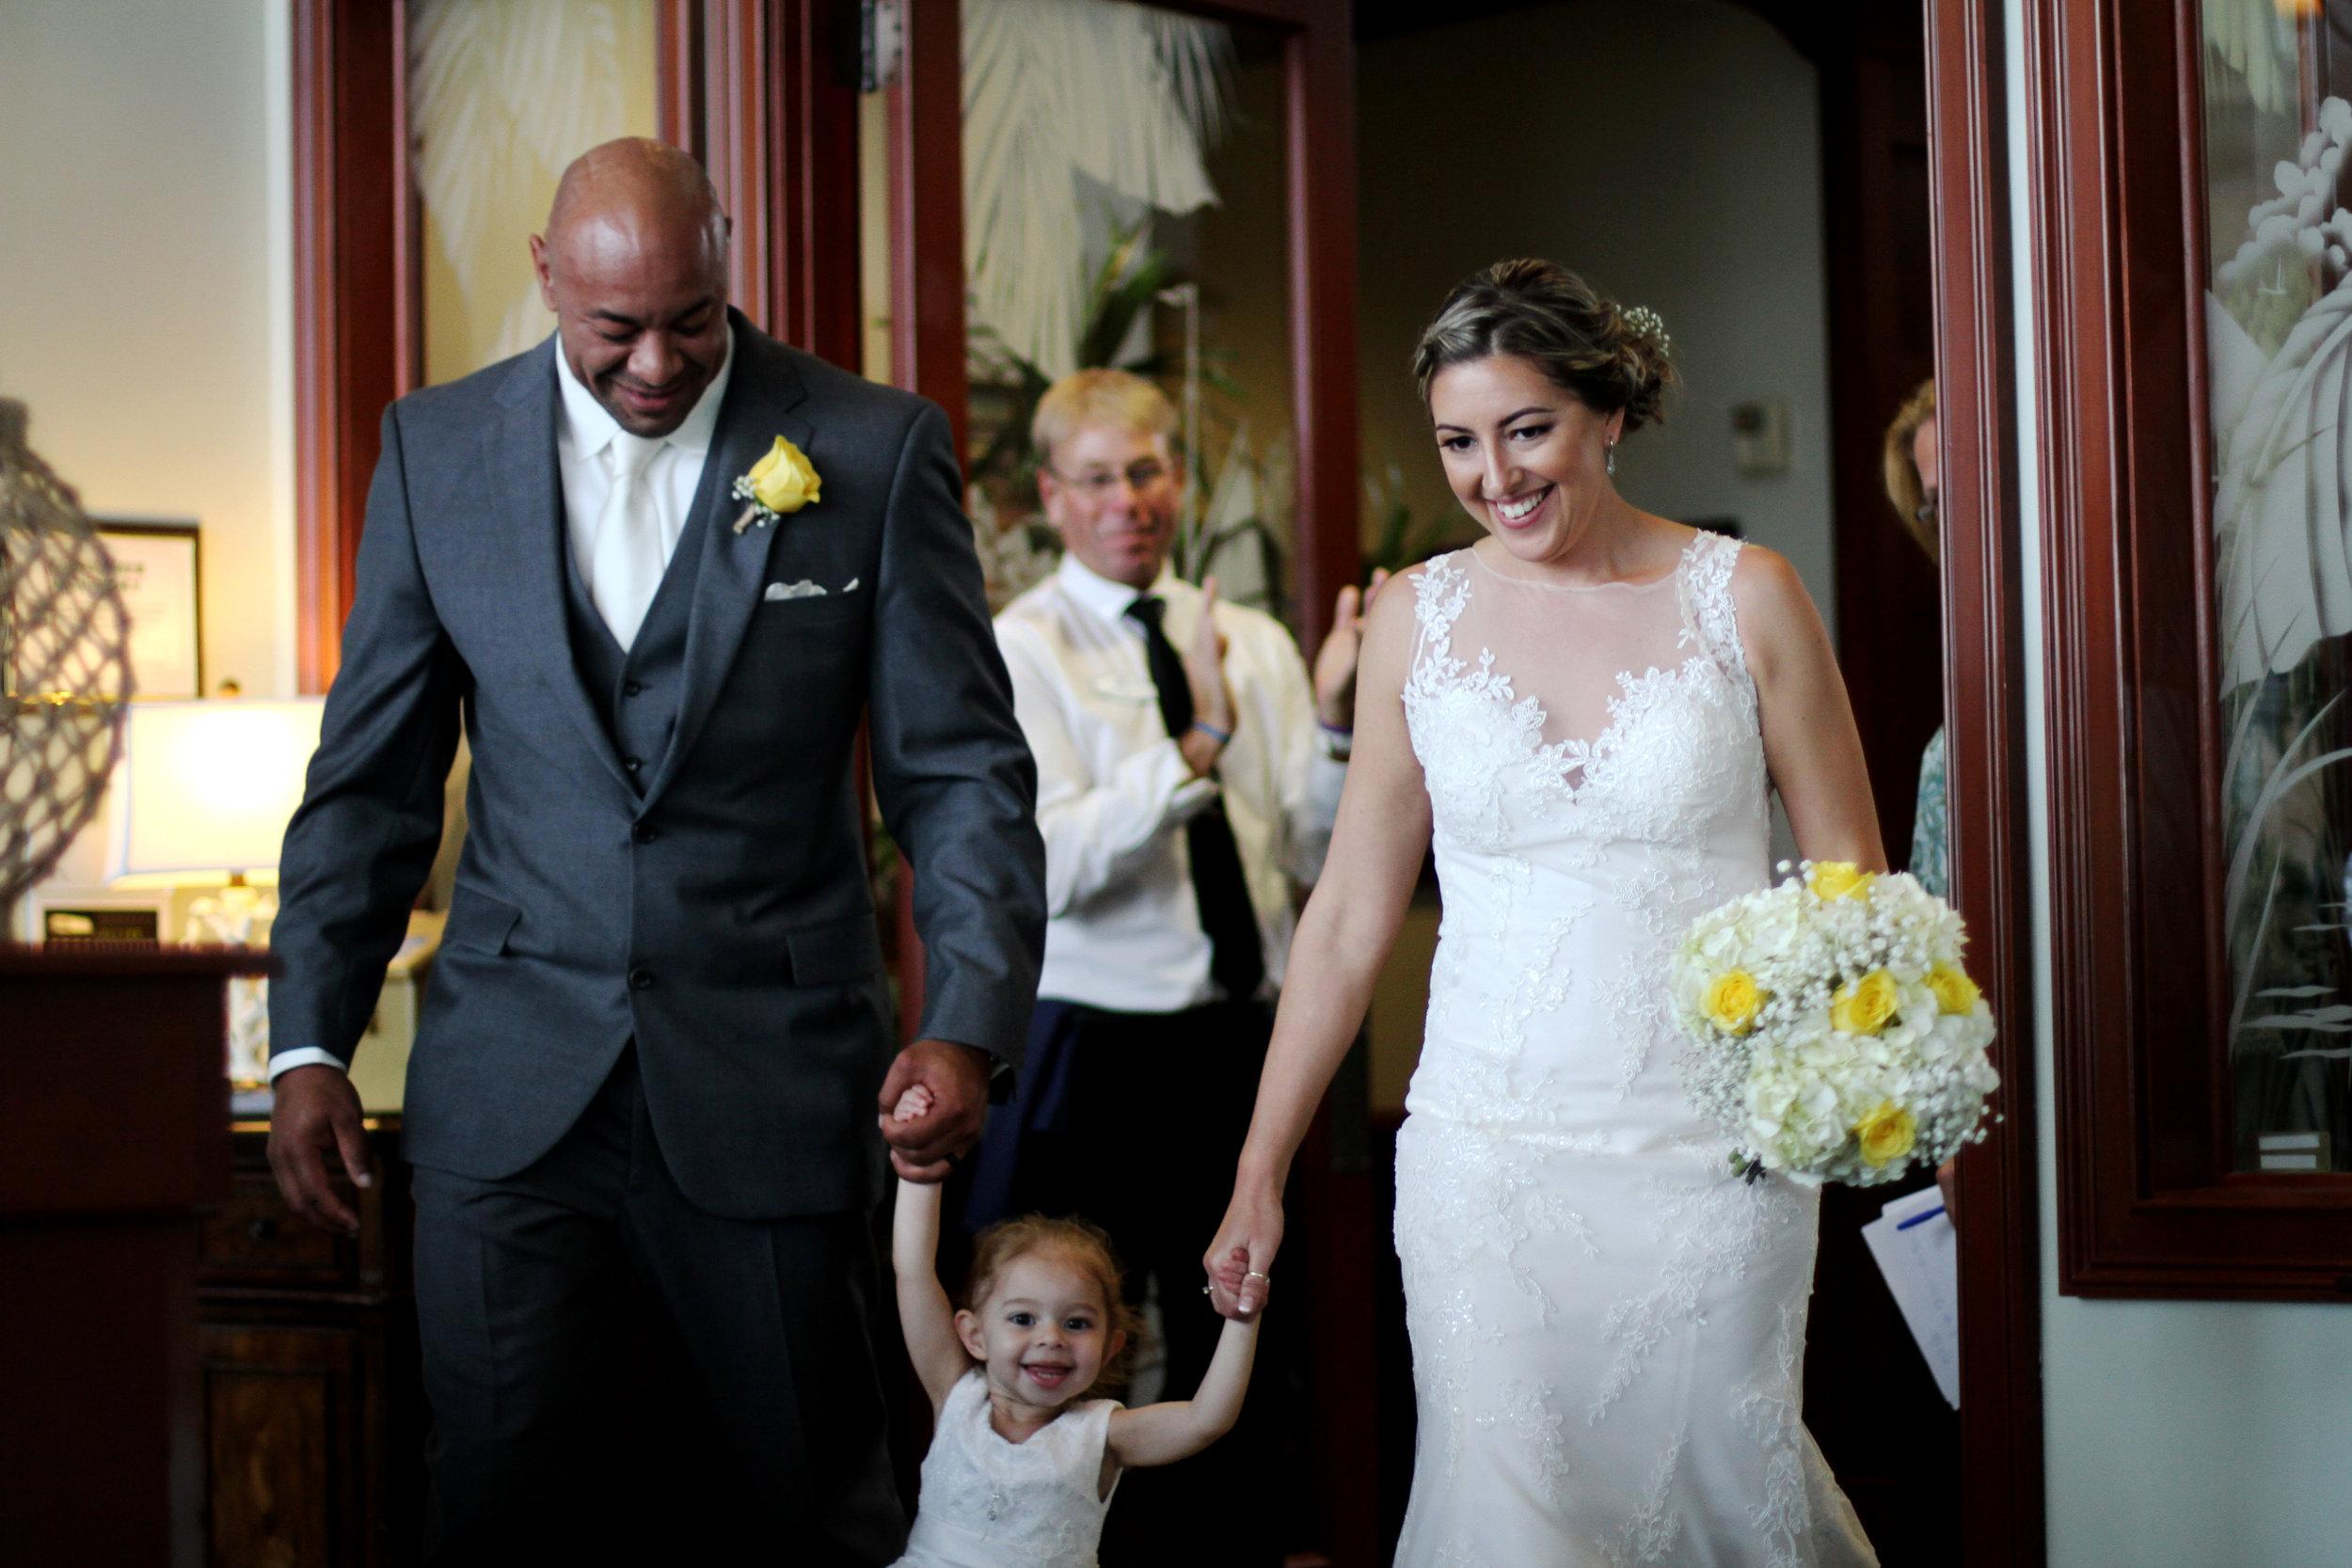 Jason and Claira wedding reception entrance